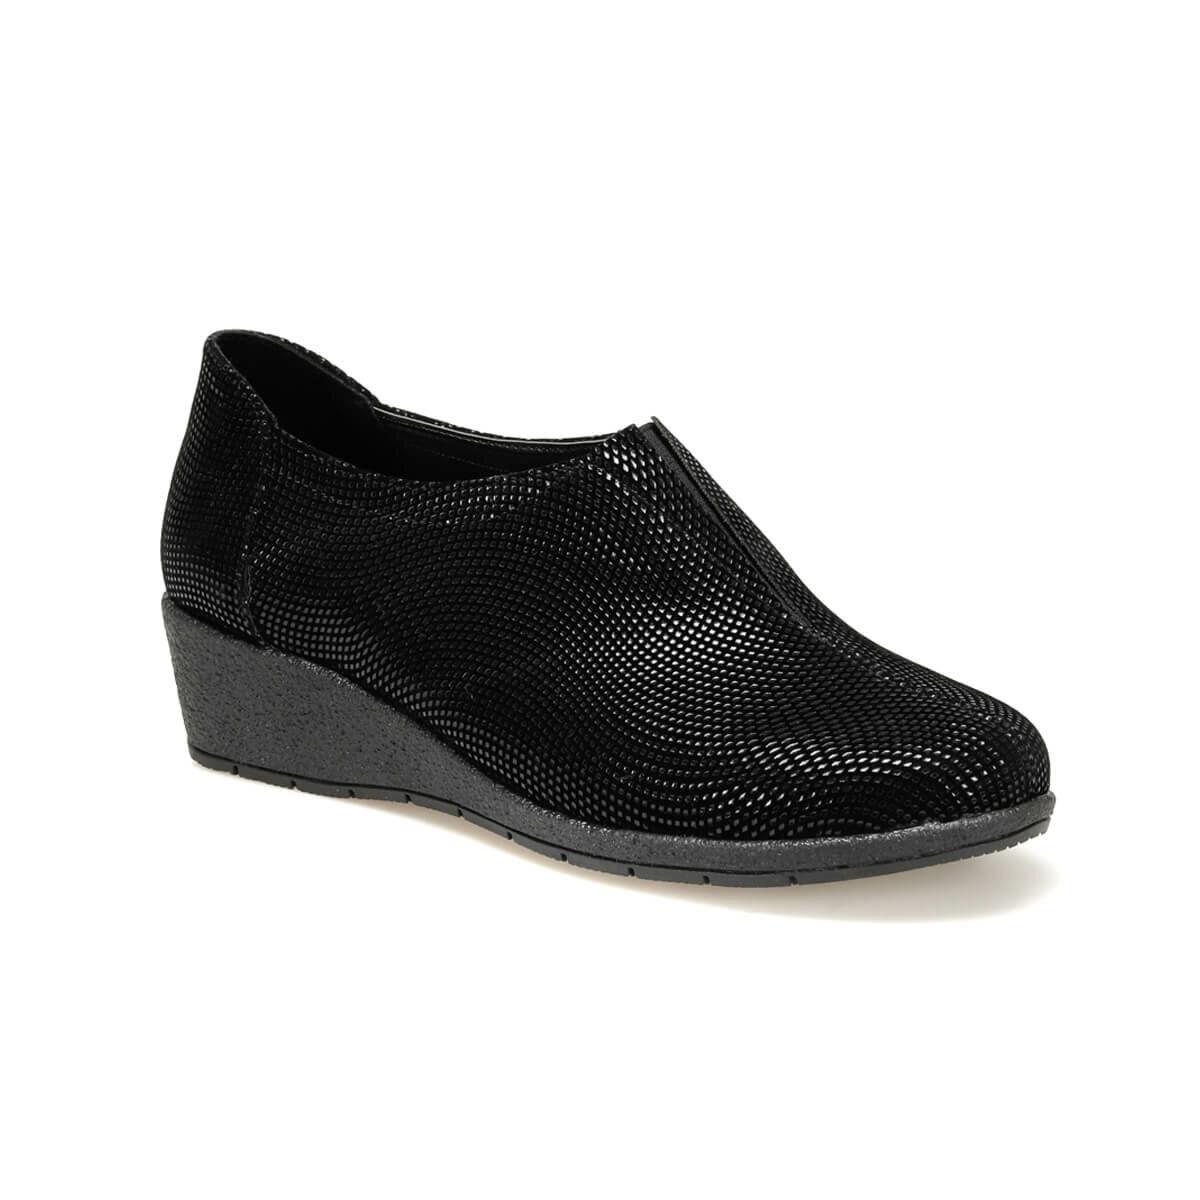 FLO TRV8227 Black Women Shoes Polaris